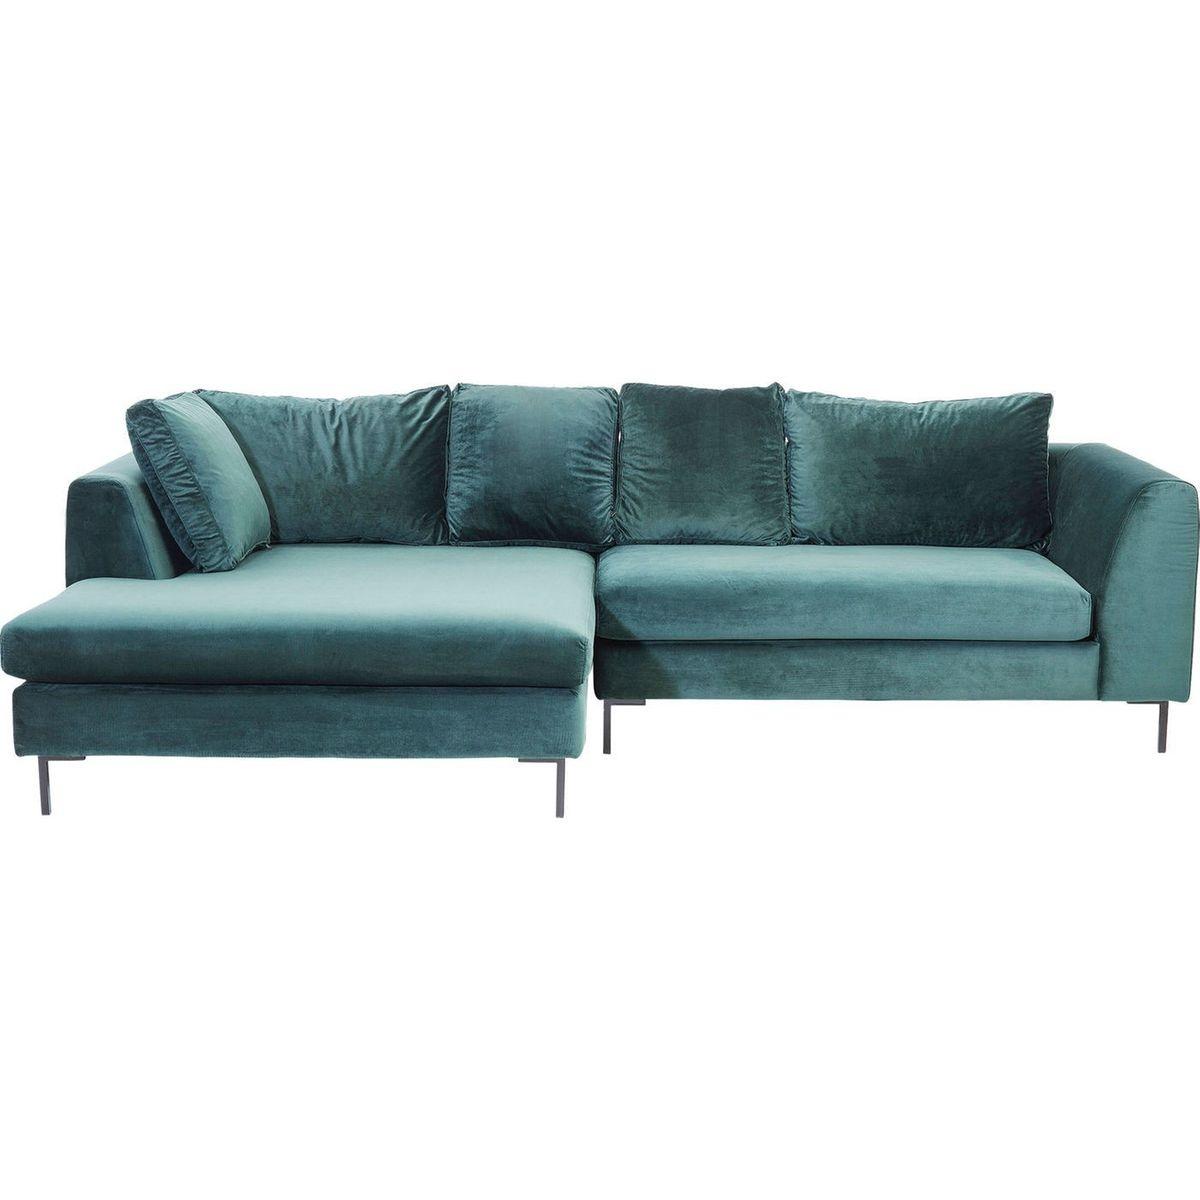 Canapé d'angle Gianna gauche Kare Design